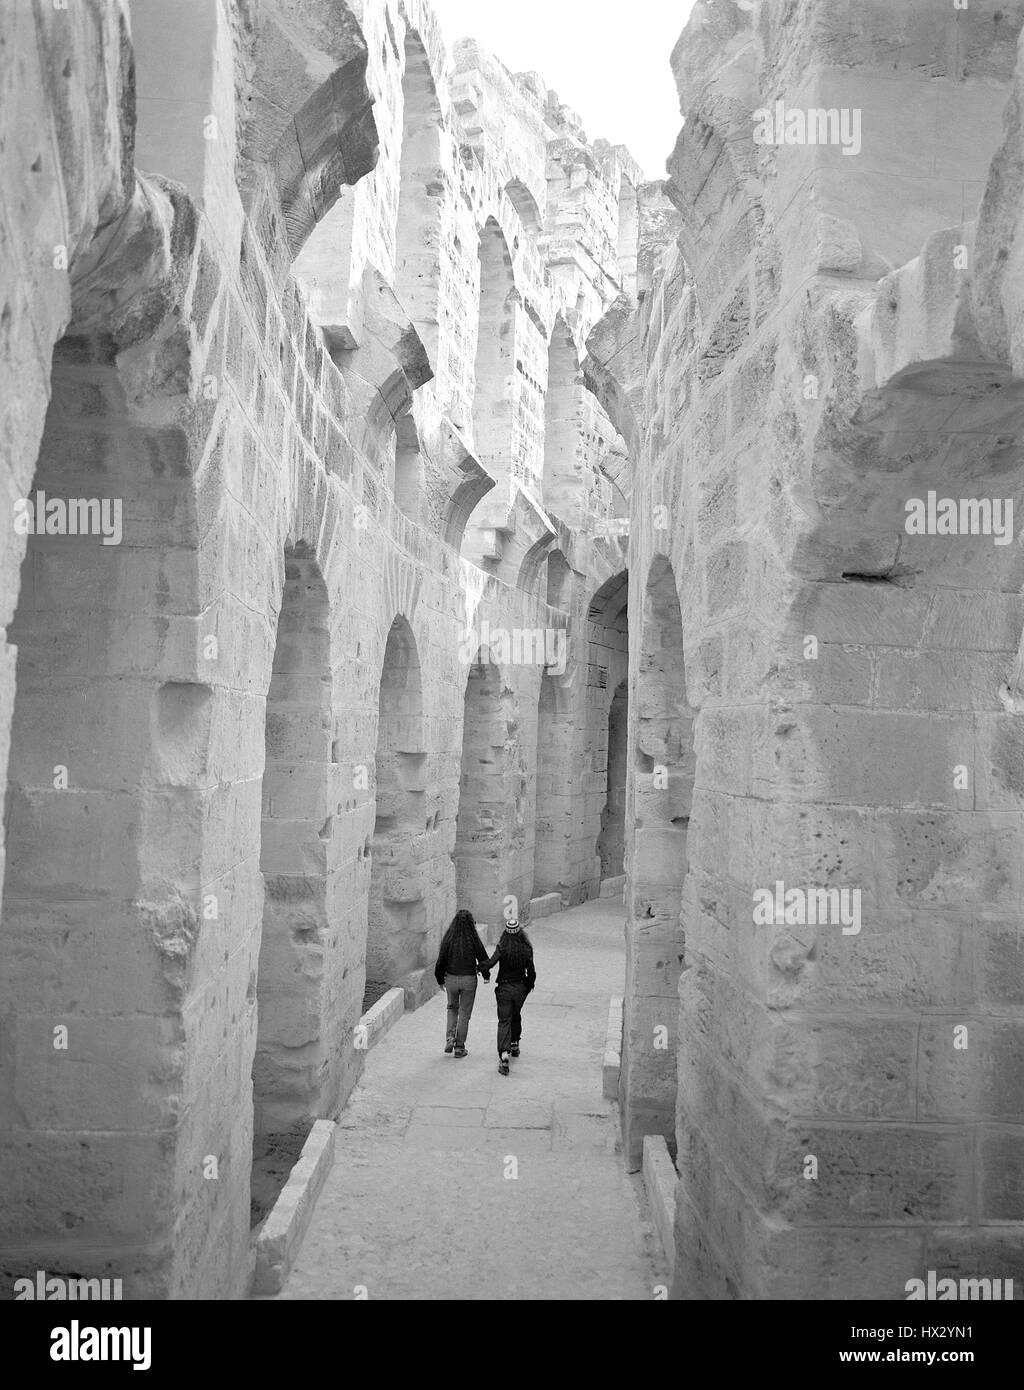 Innenraum des Kolosseums El Jem in zentralen Tunesien, Nordafrika Stockbild